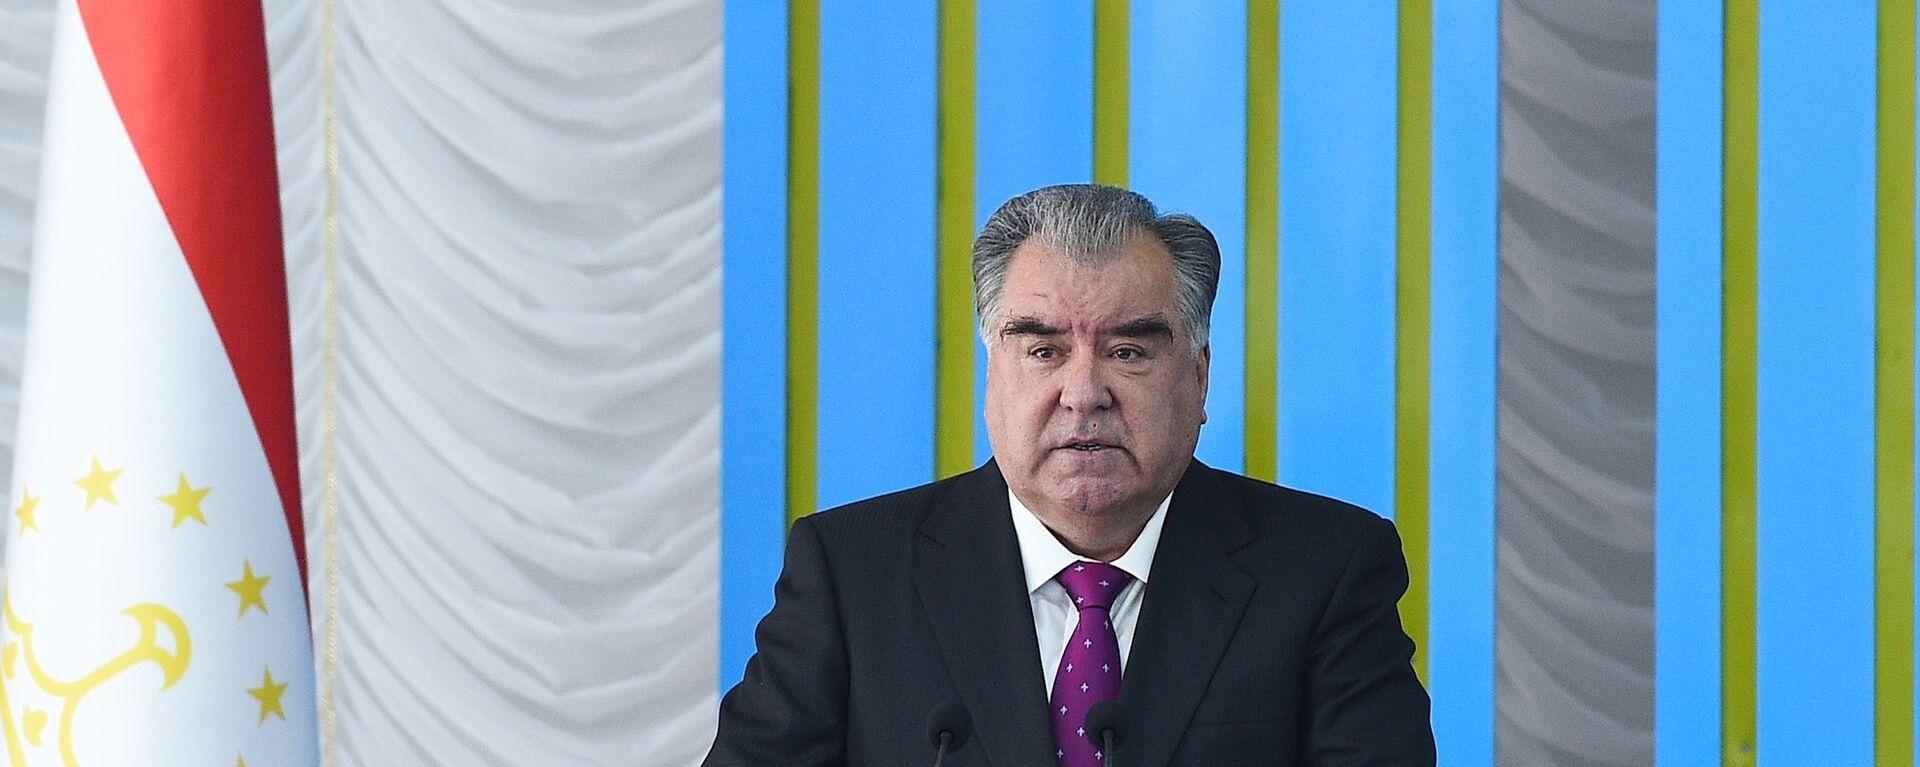 Президент Республики Таджикистан Эмомали Рахмон - Sputnik Тоҷикистон, 1920, 10.12.2020